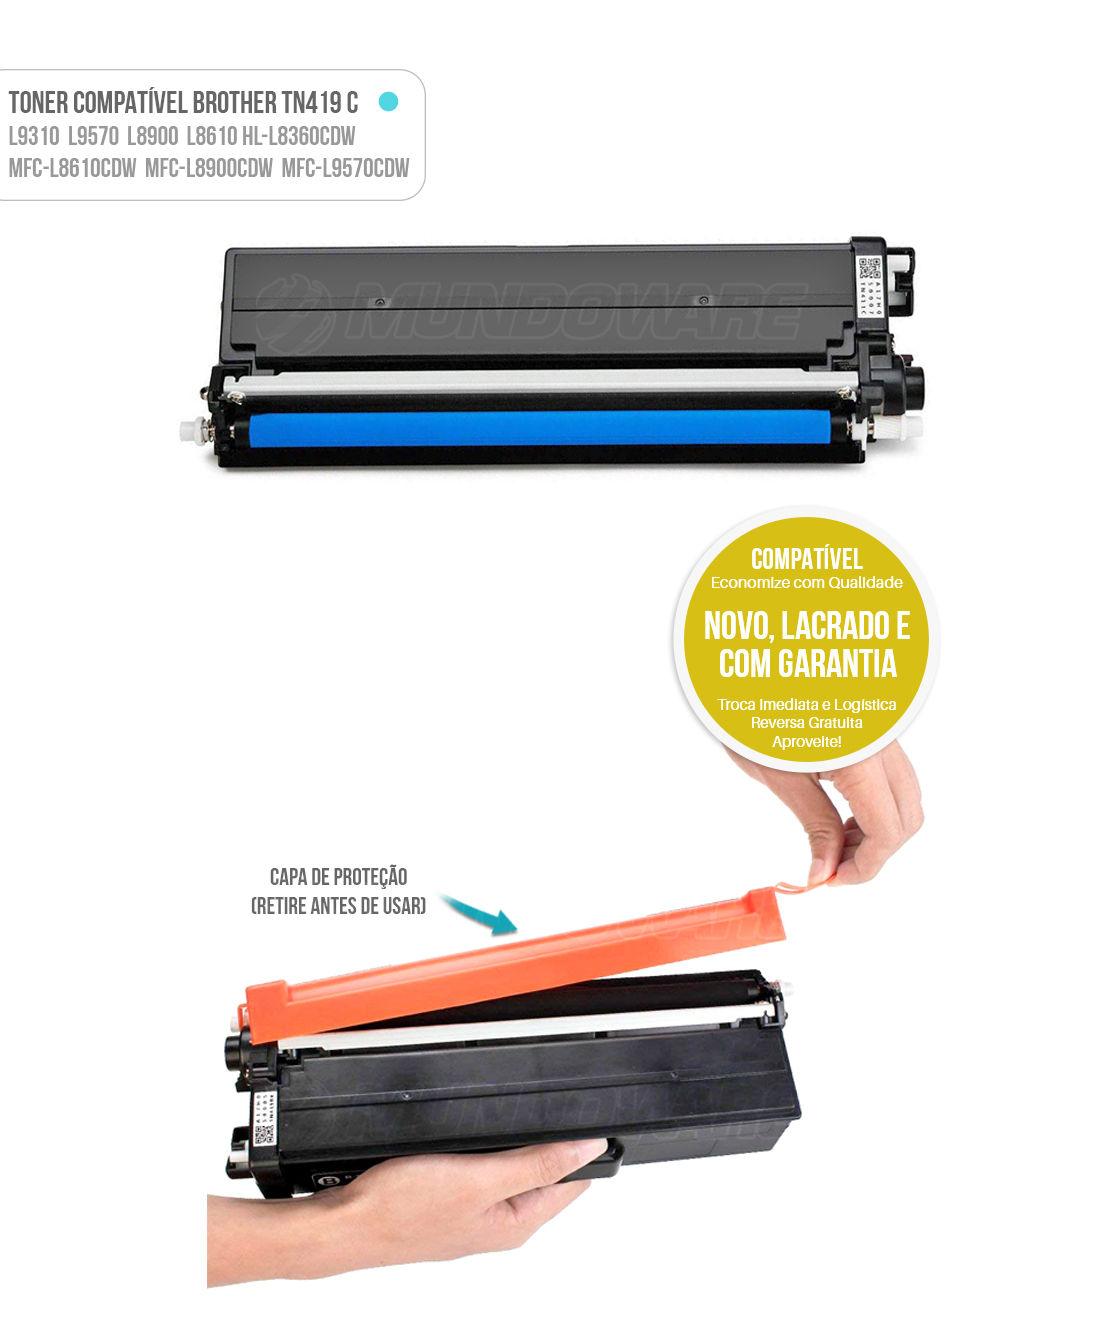 Toner Ciano Compatível com TN419 TN-419C para impressora Brother HL-L8360CDW MFC-L8610CDW L8900CDW L9570CDW L8360 L8610 L8900